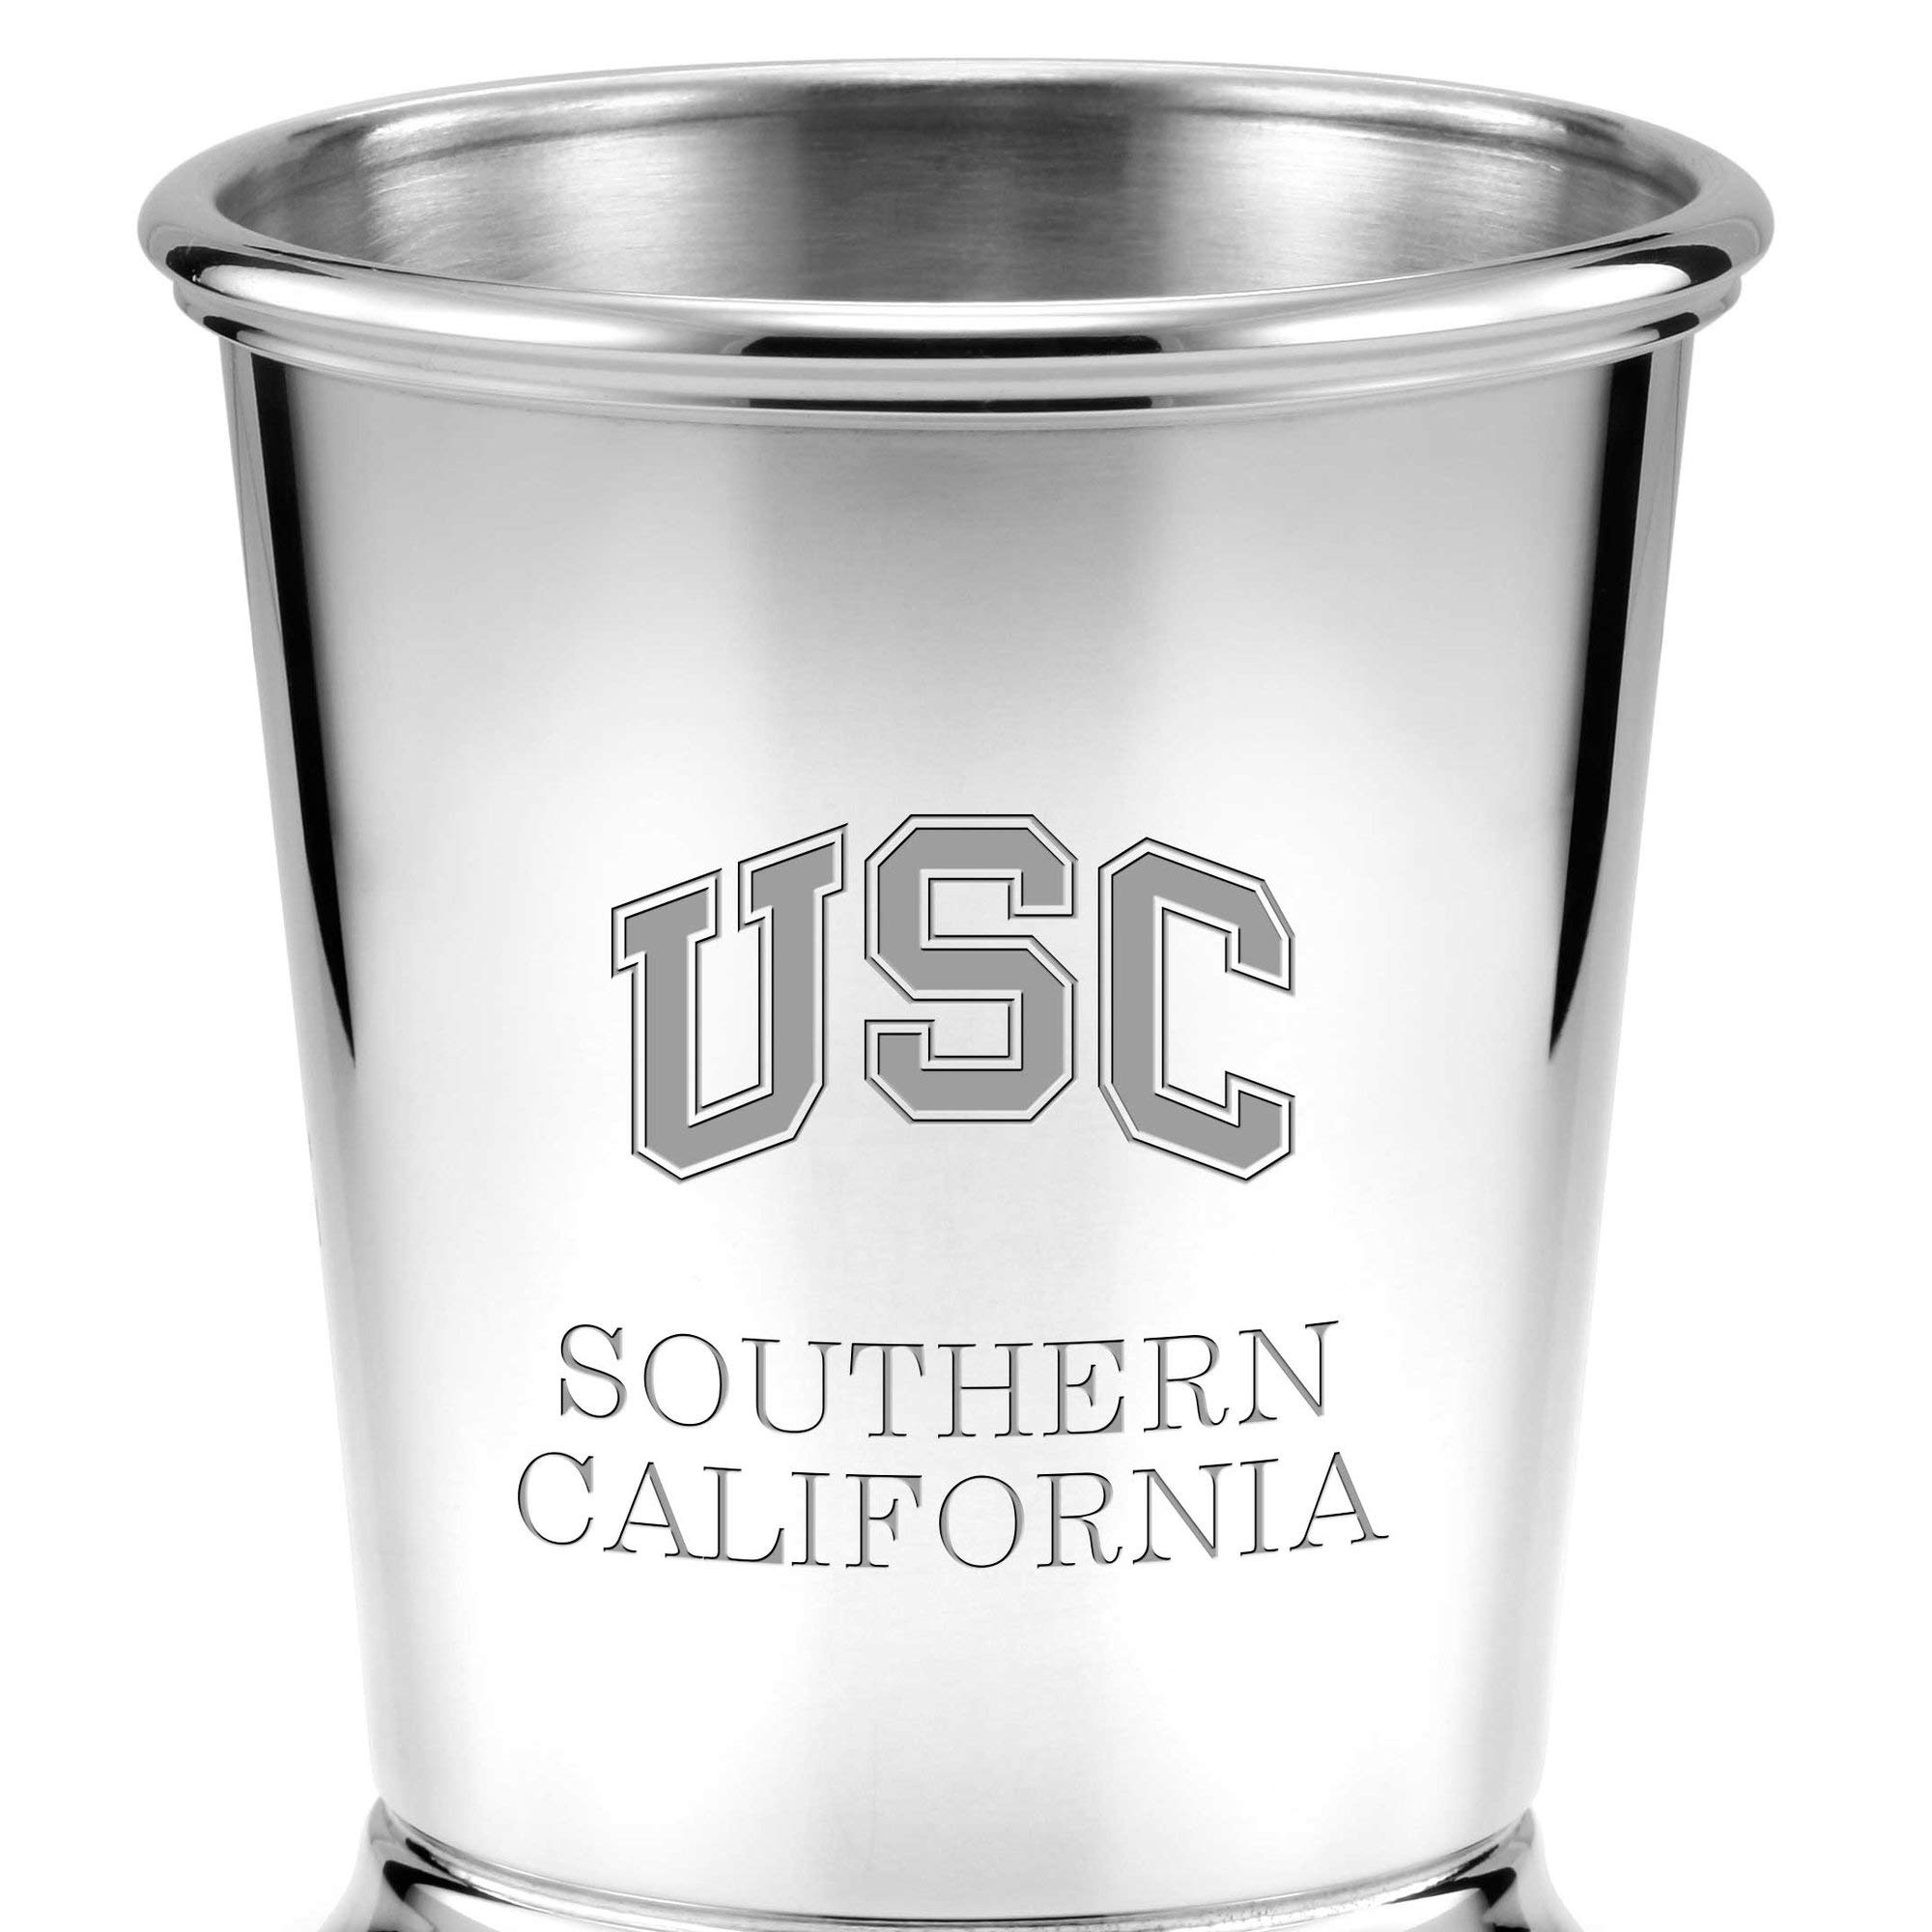 M. LA HART University of Southern California Pewter Julep Cup by M. LA HART (Image #2)